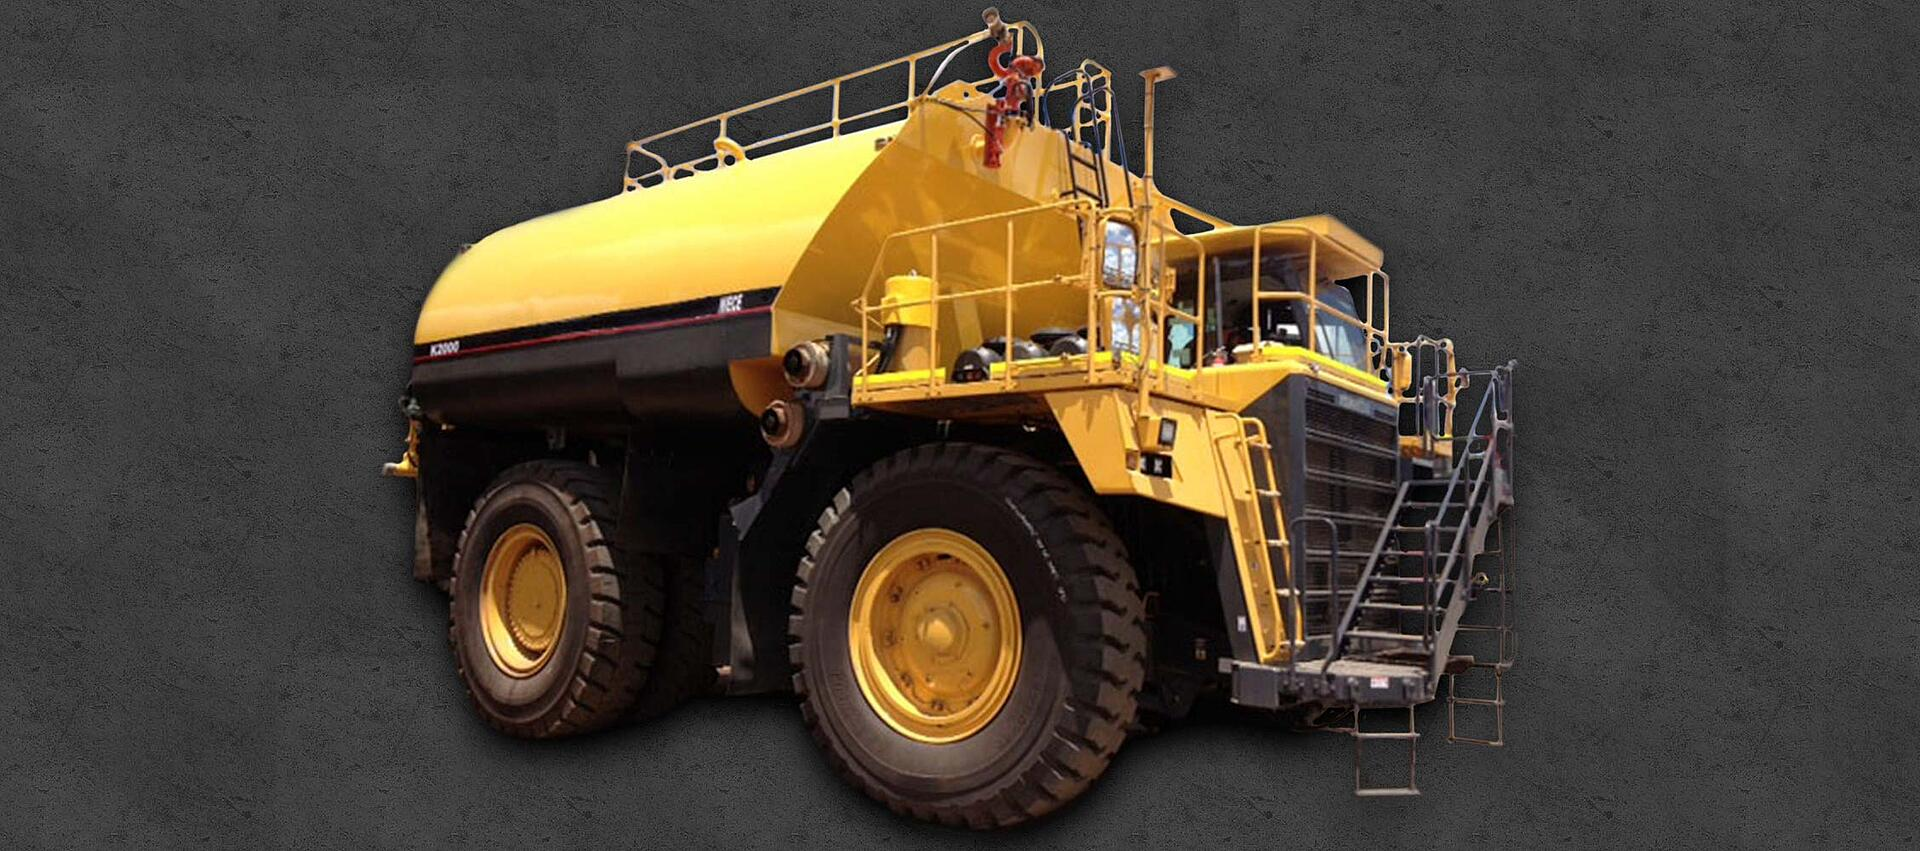 Niece Equipment 20,000 Gallon Rigid Frame Water Truck